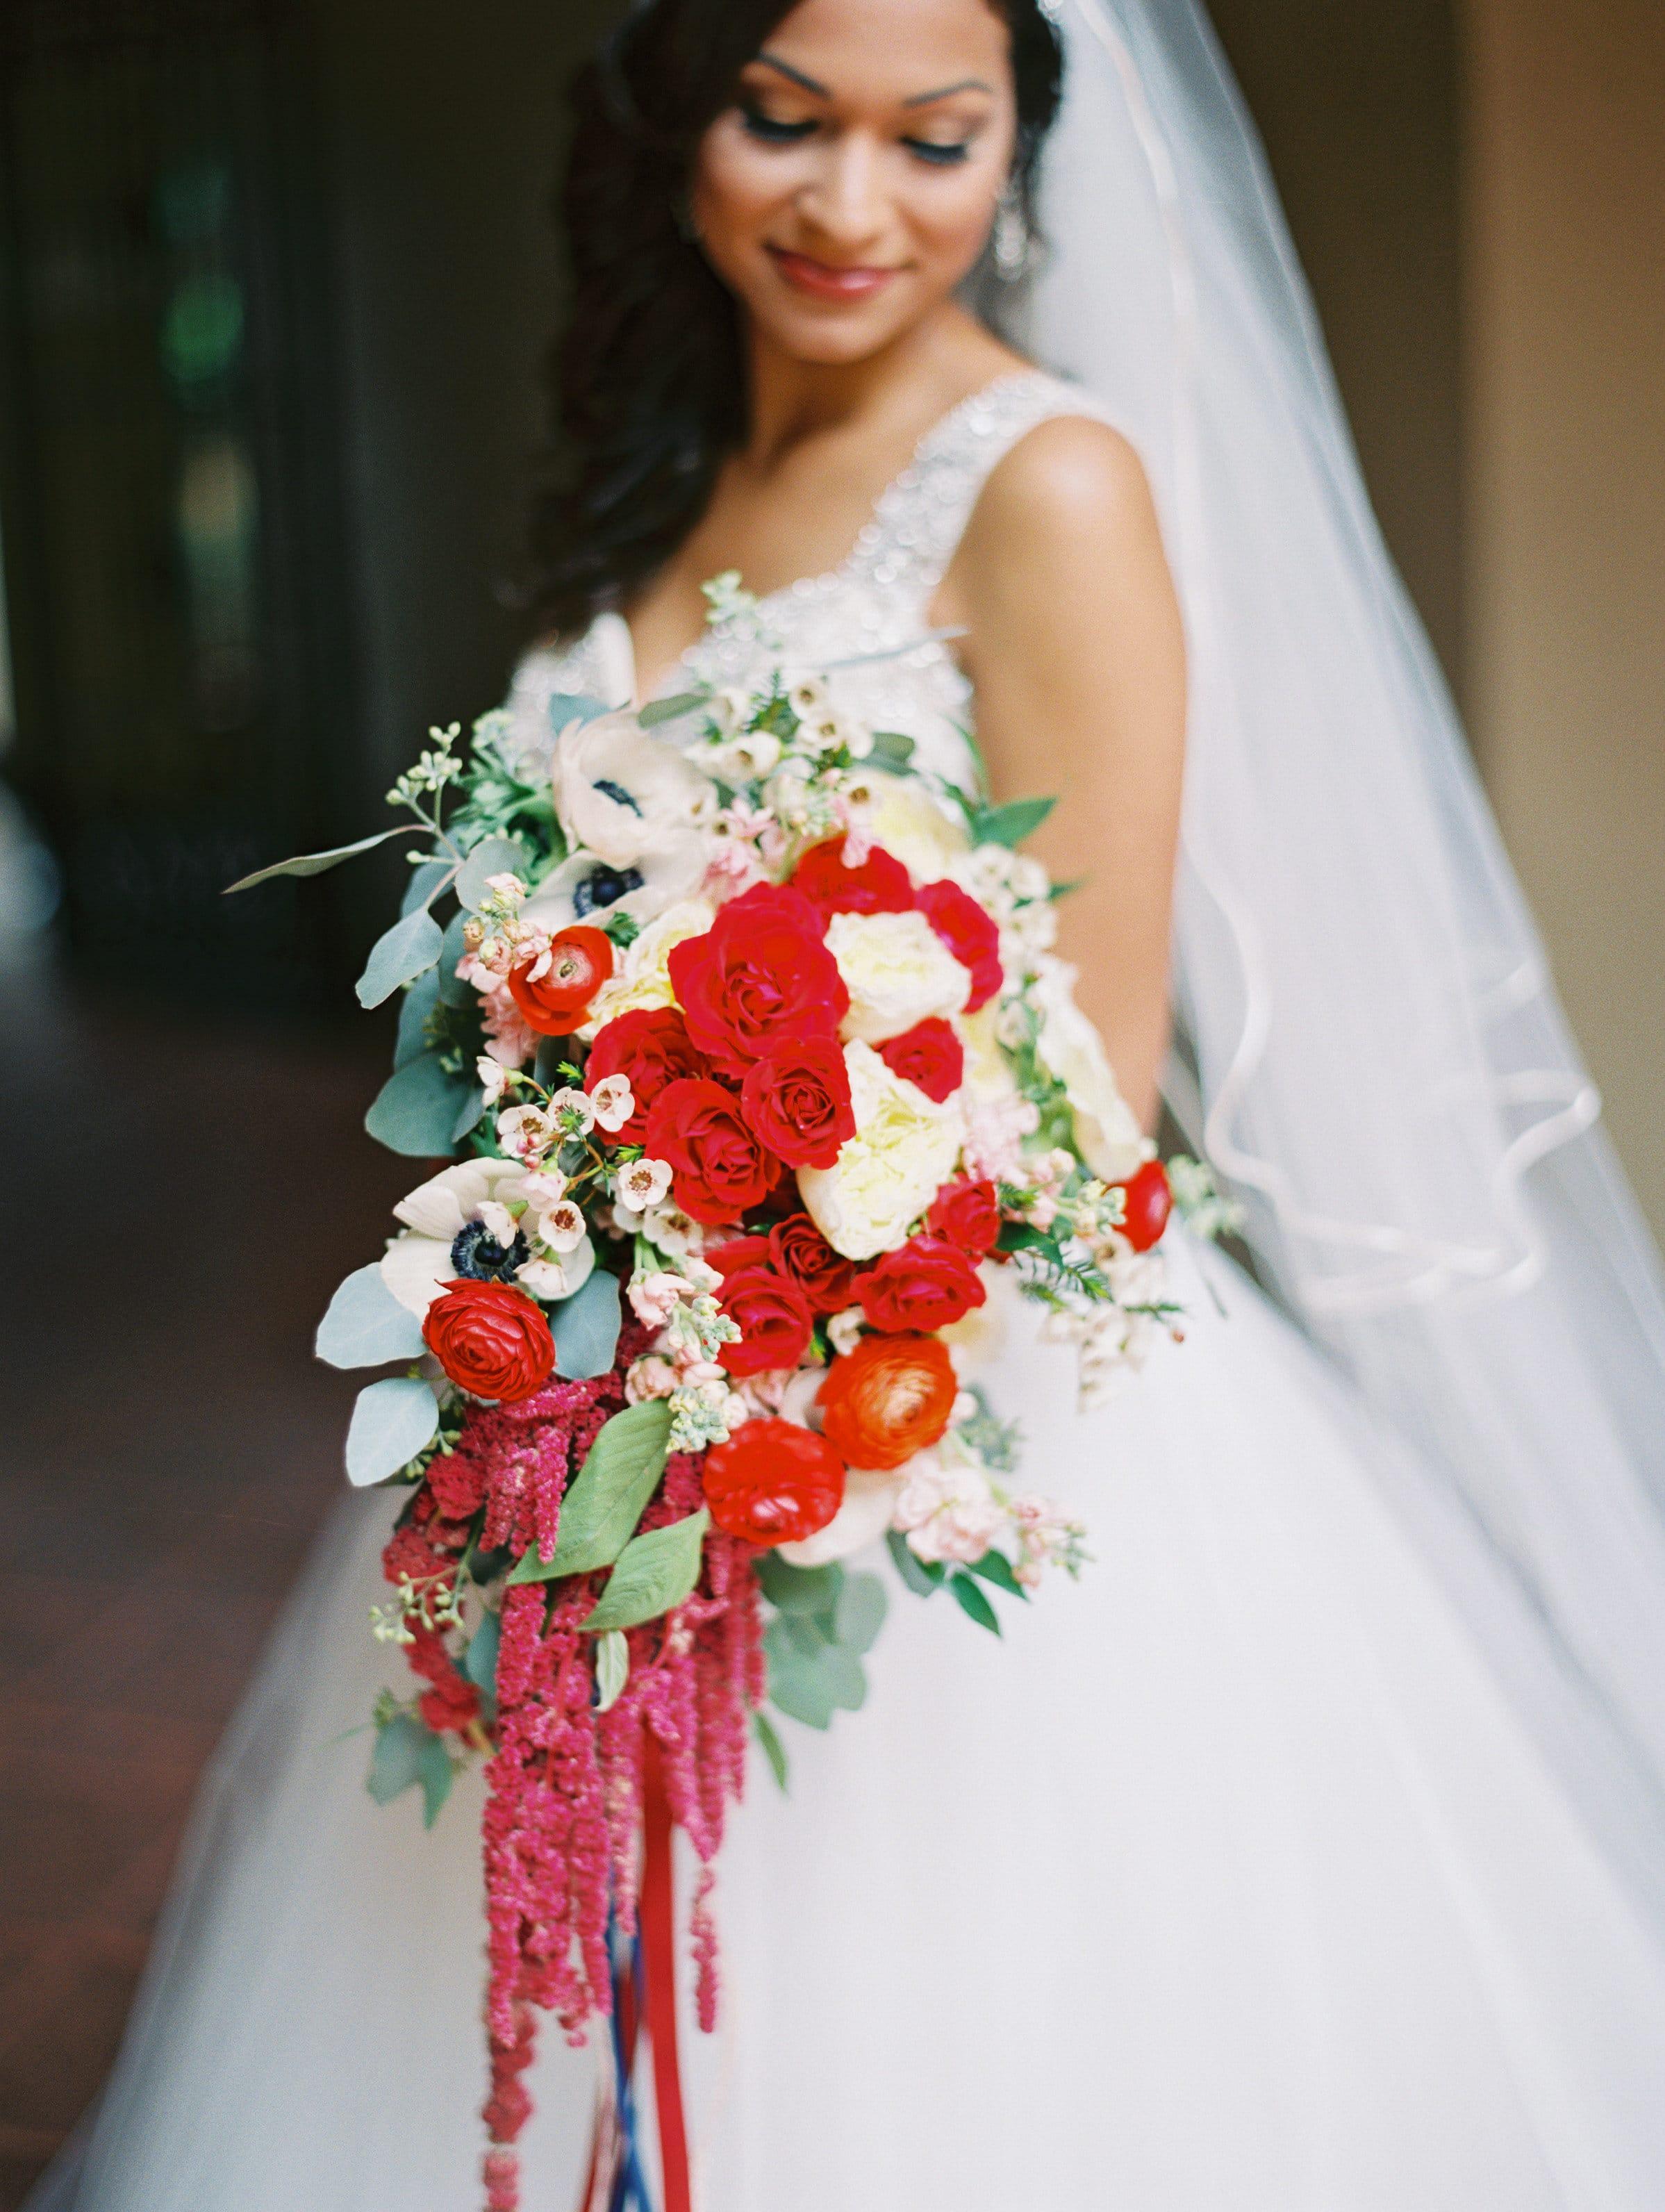 Bride Holding Romantic Red Wedding Bouquet